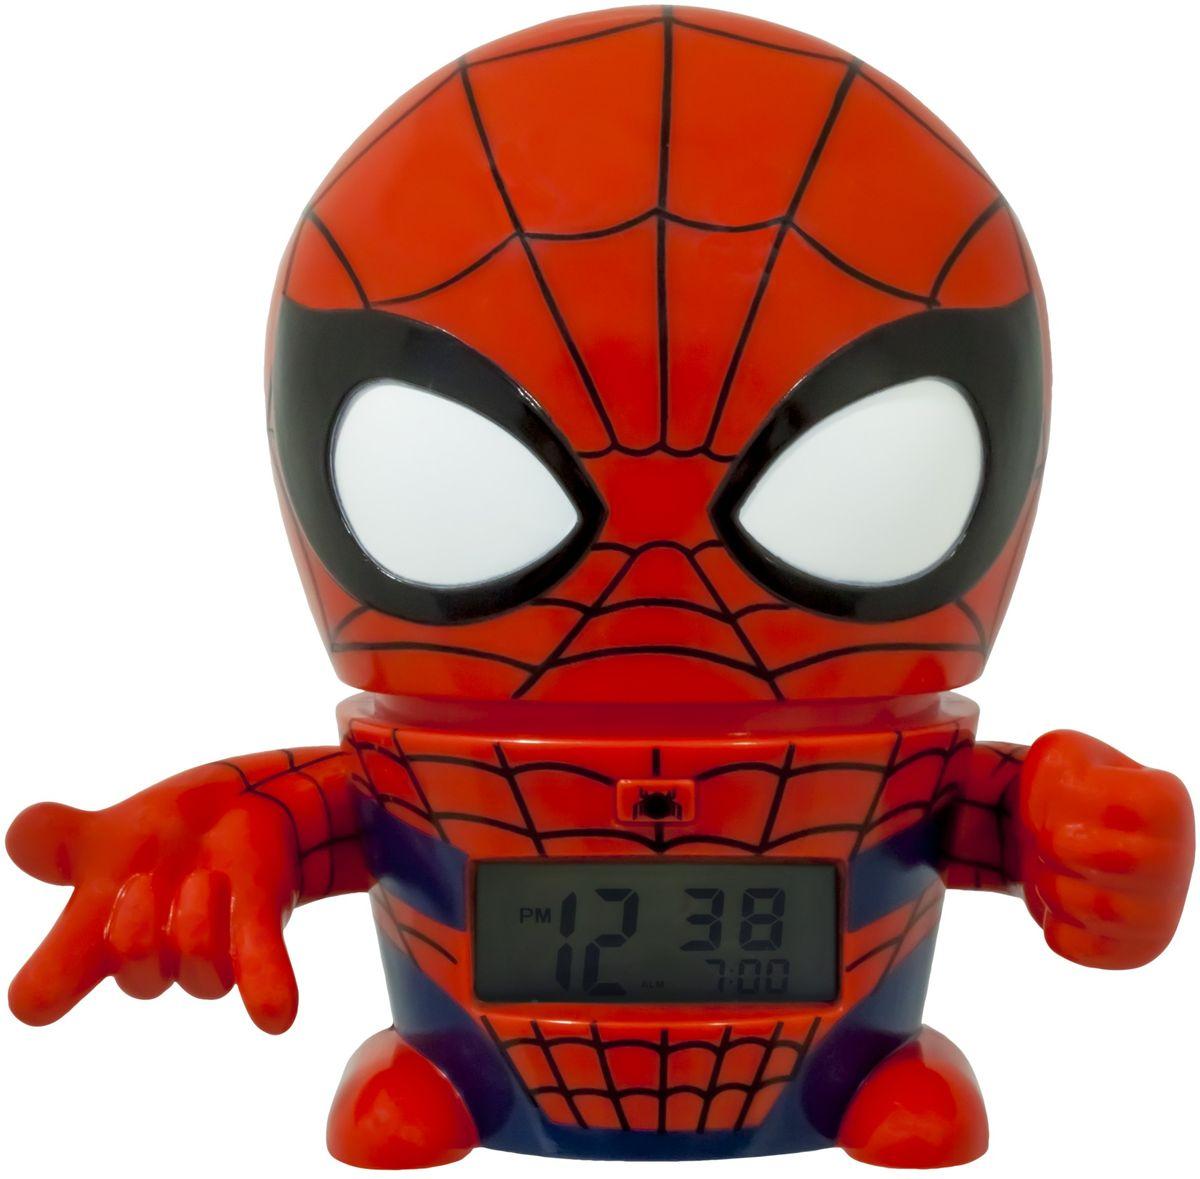 Marvel Spider-Man Будильник BulbBotz Spider-Man - Радиобудильники и проекционные часы